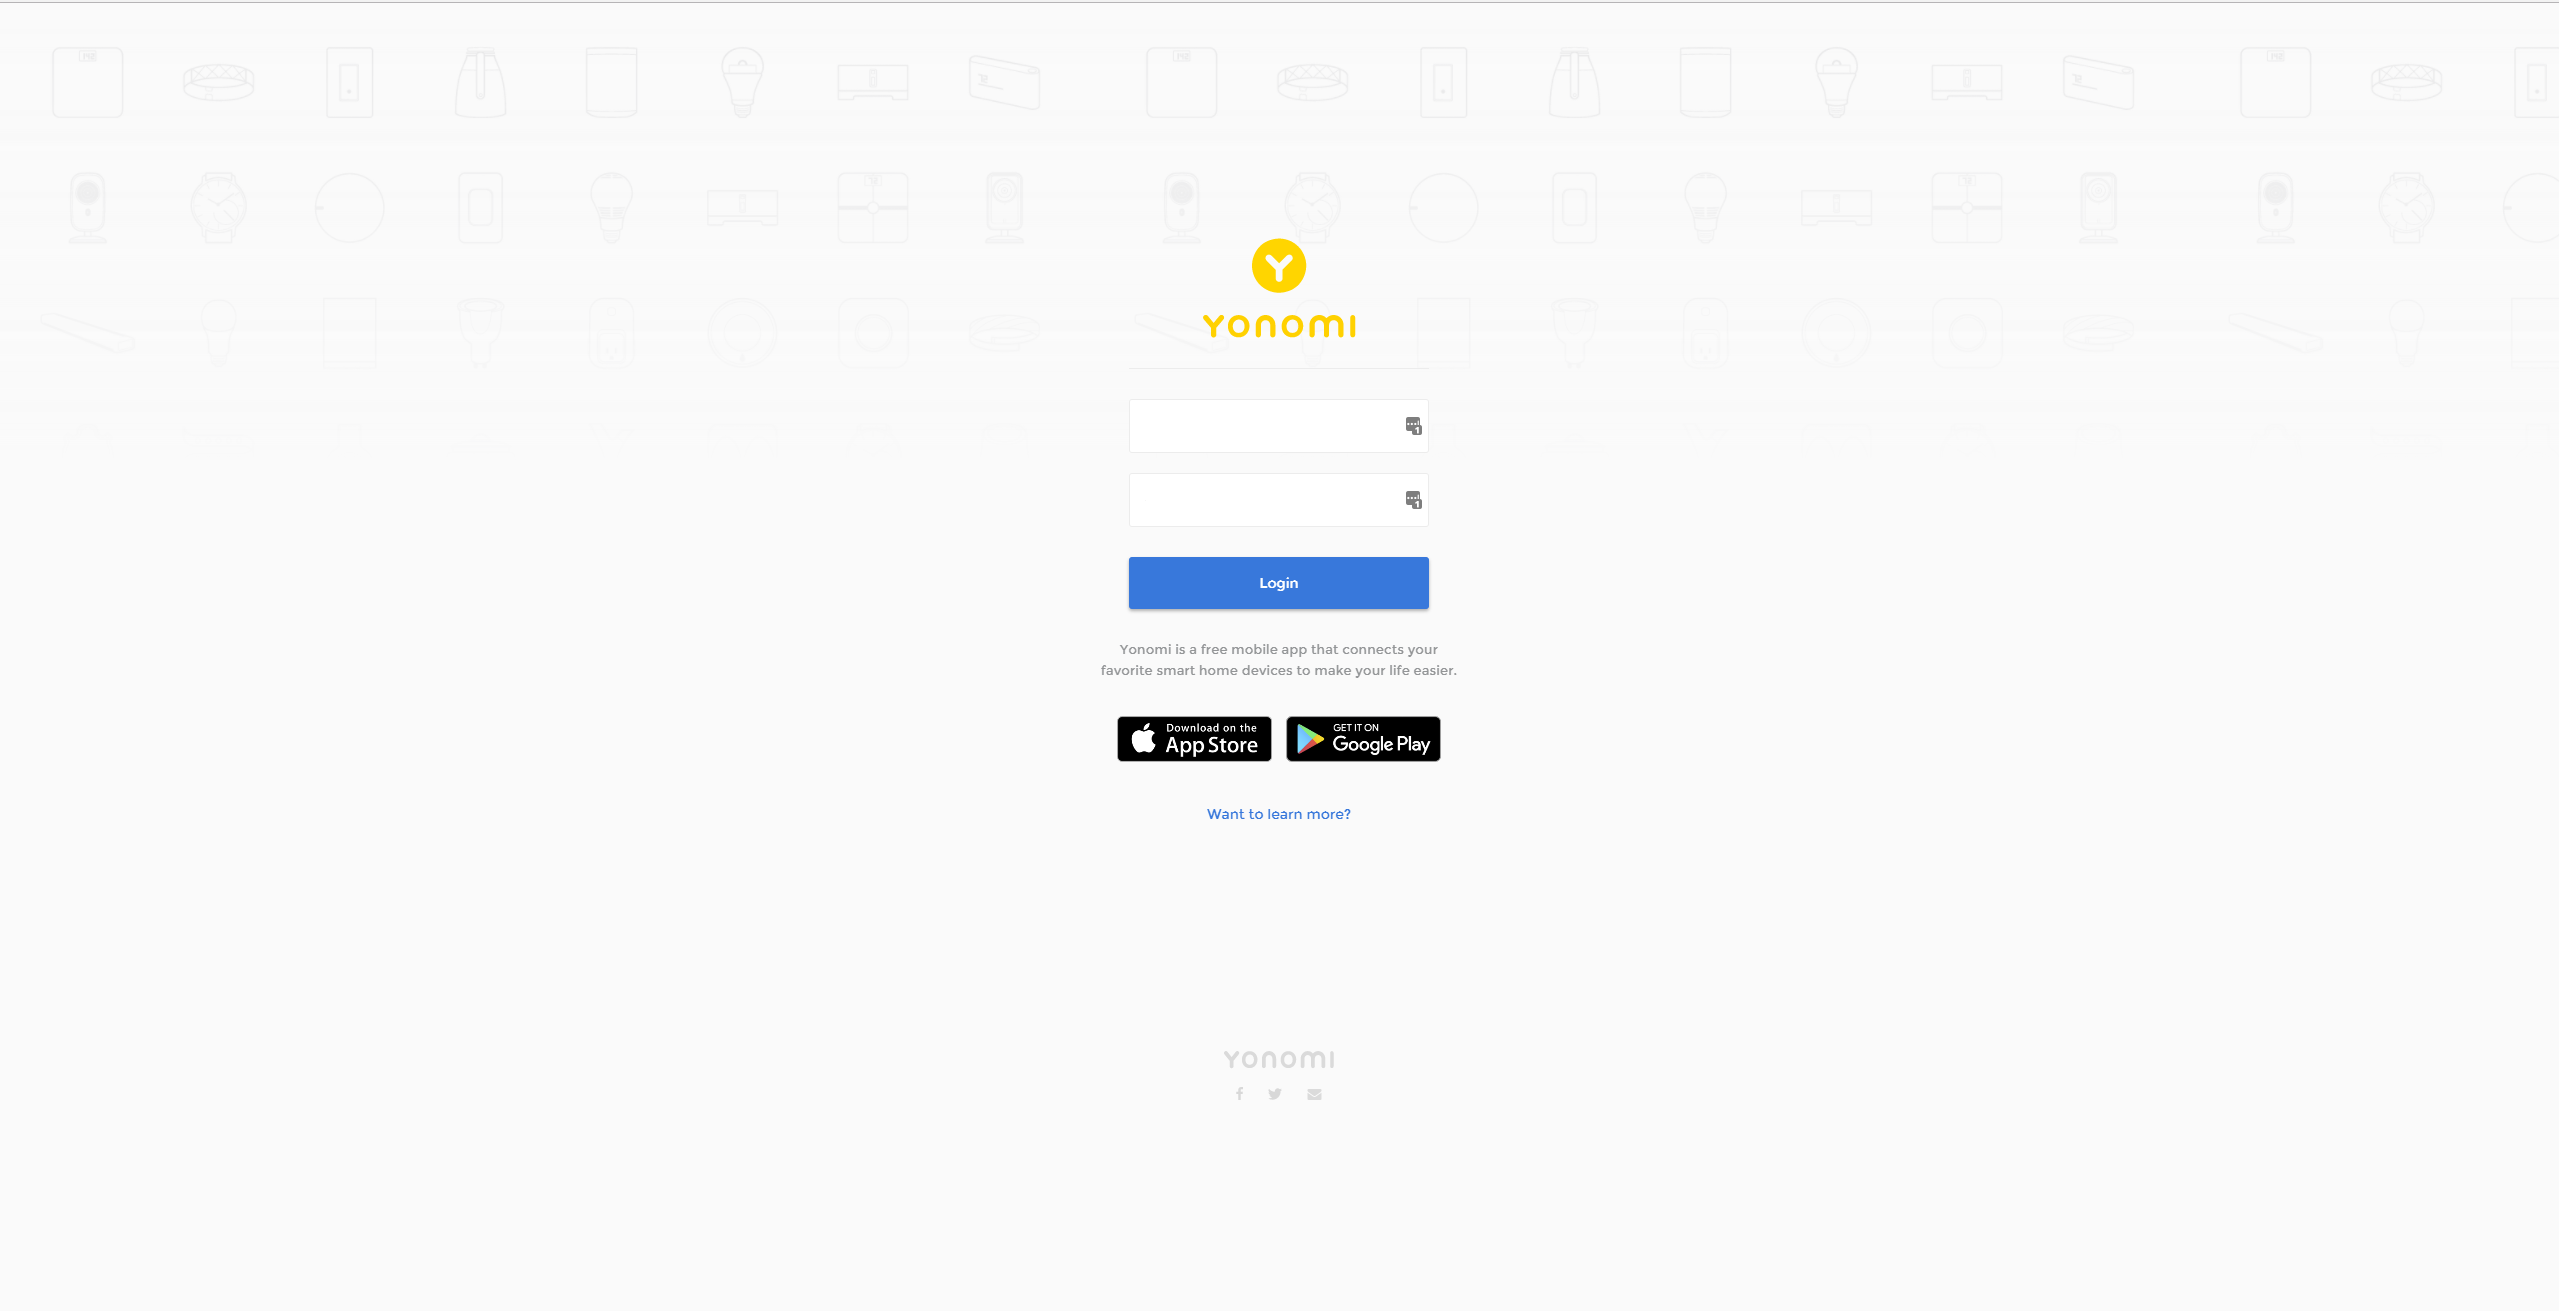 Logitech-Harmony-Hub-mit-Amazon-Alexa-und-Yonomi-PC-2